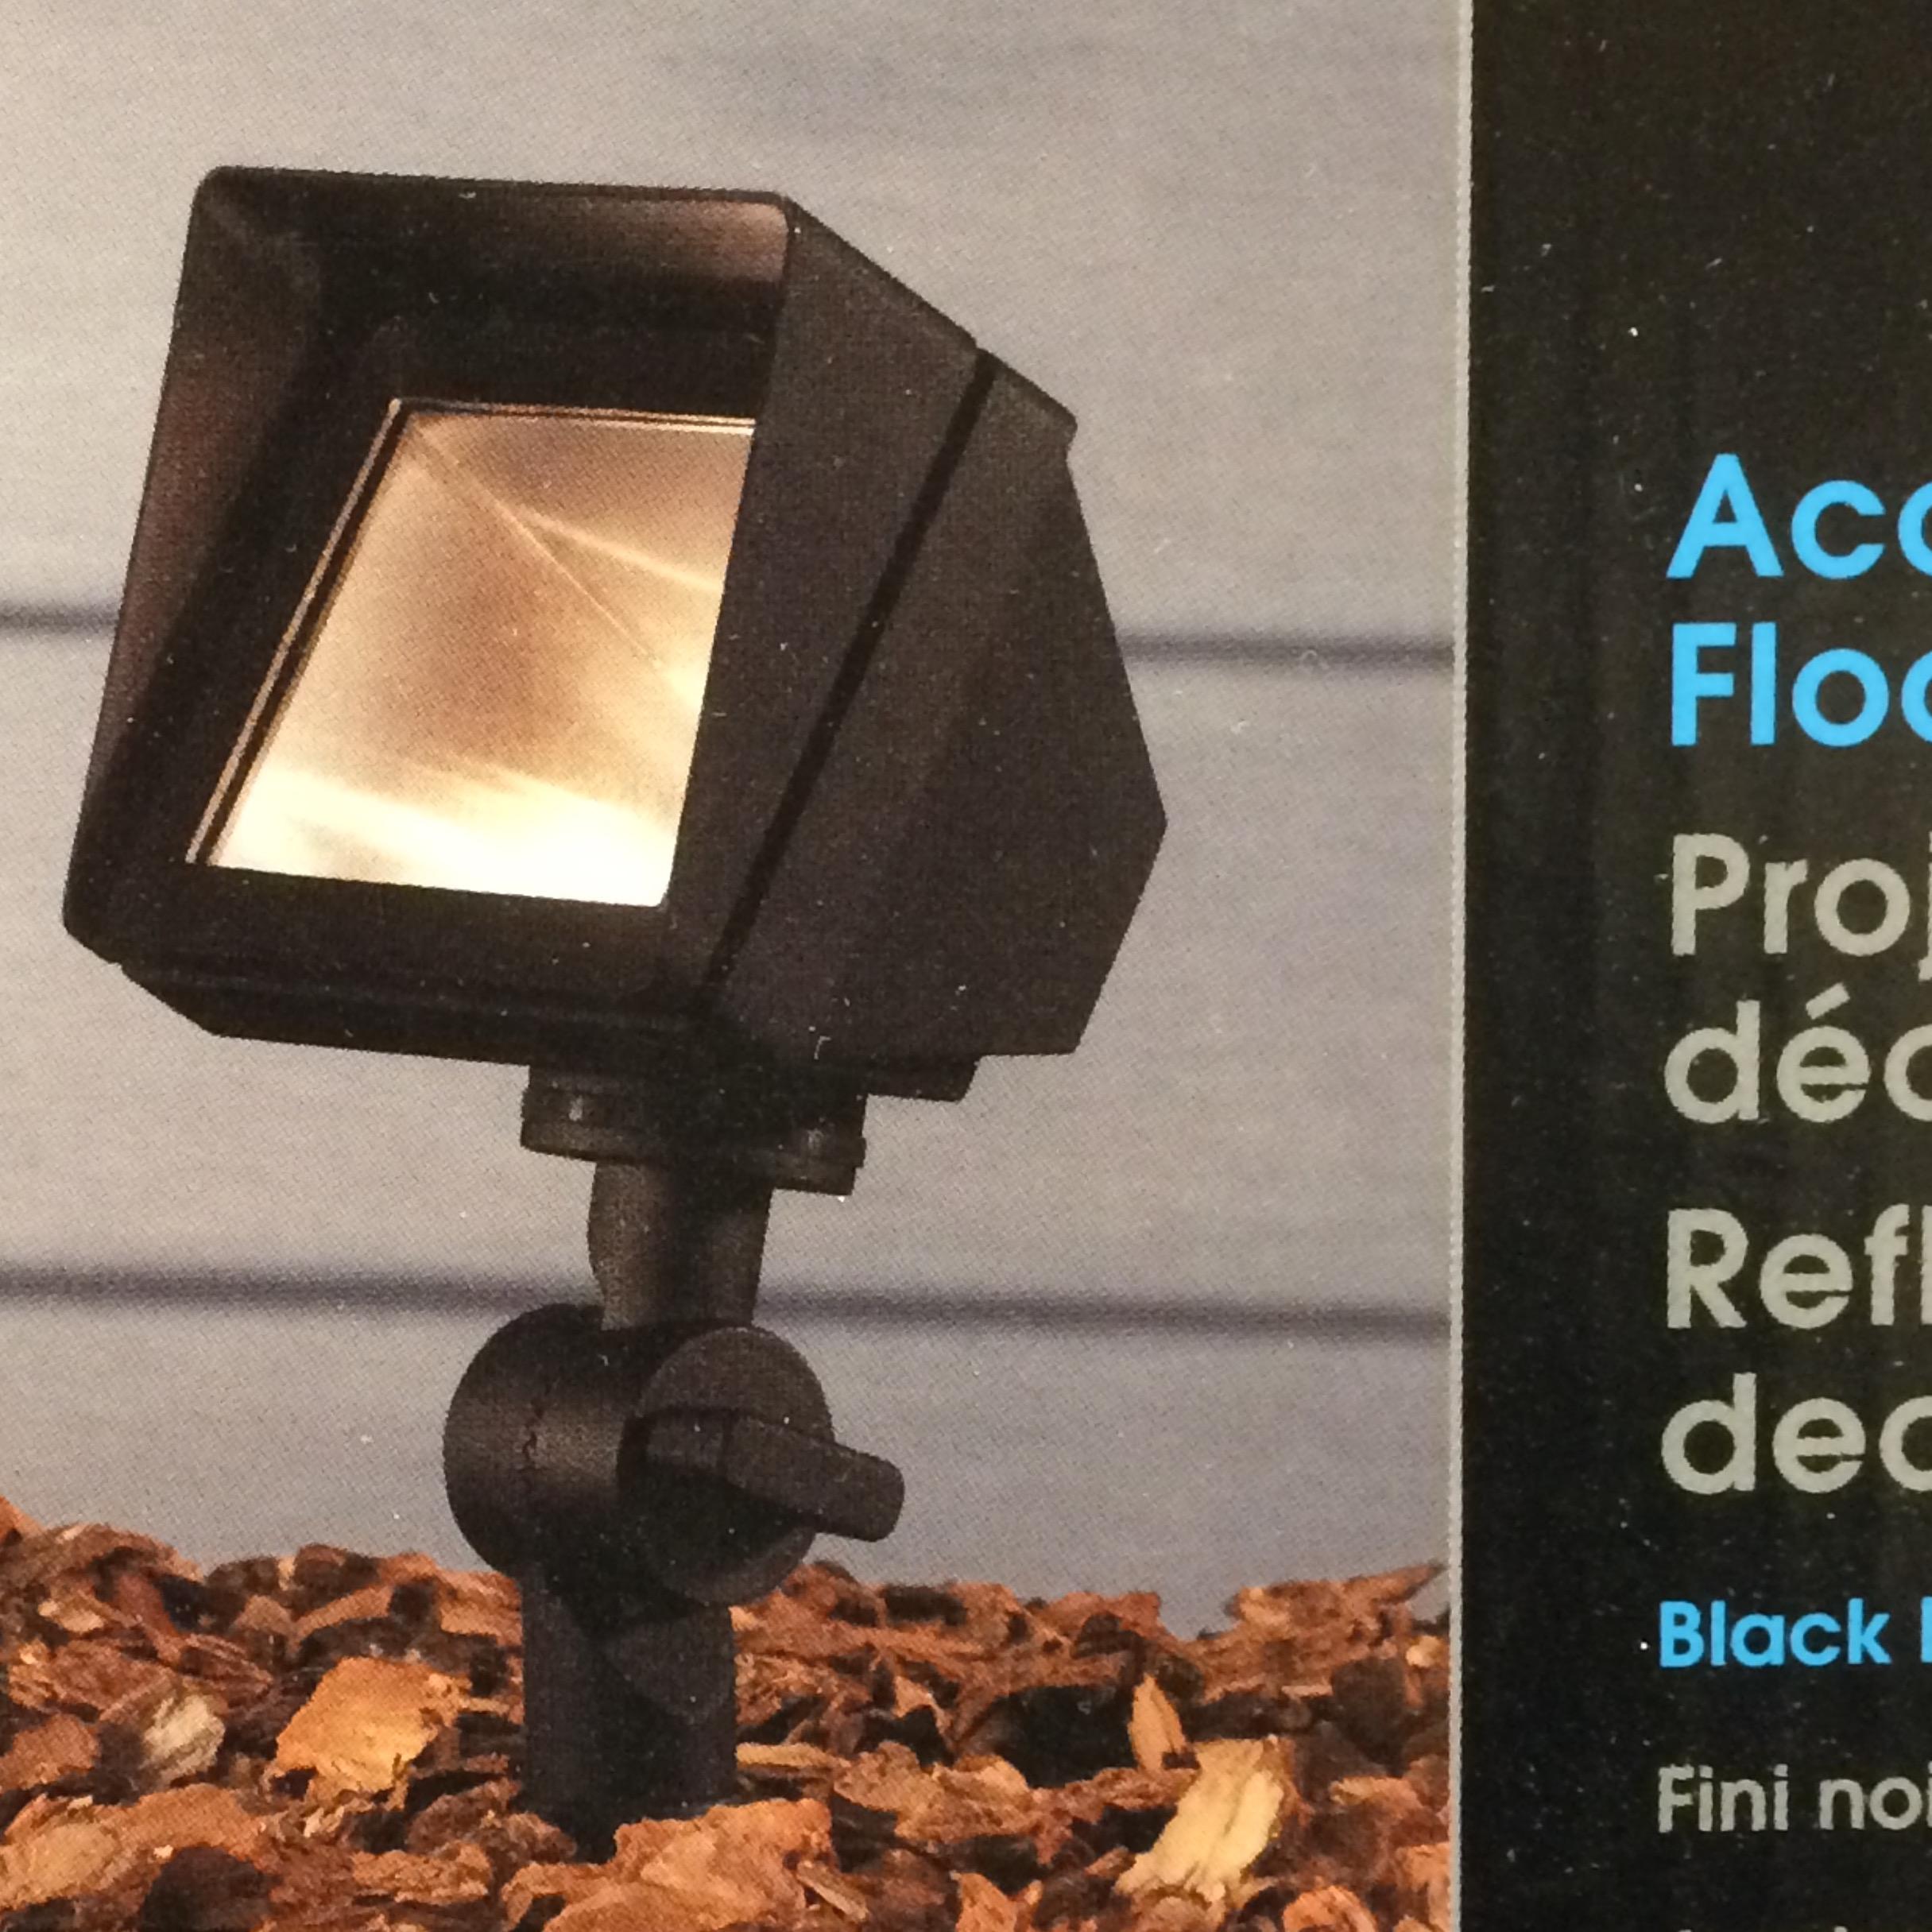 Do it yourself landscape lighting kits : Landscape lighting kits vs contractors